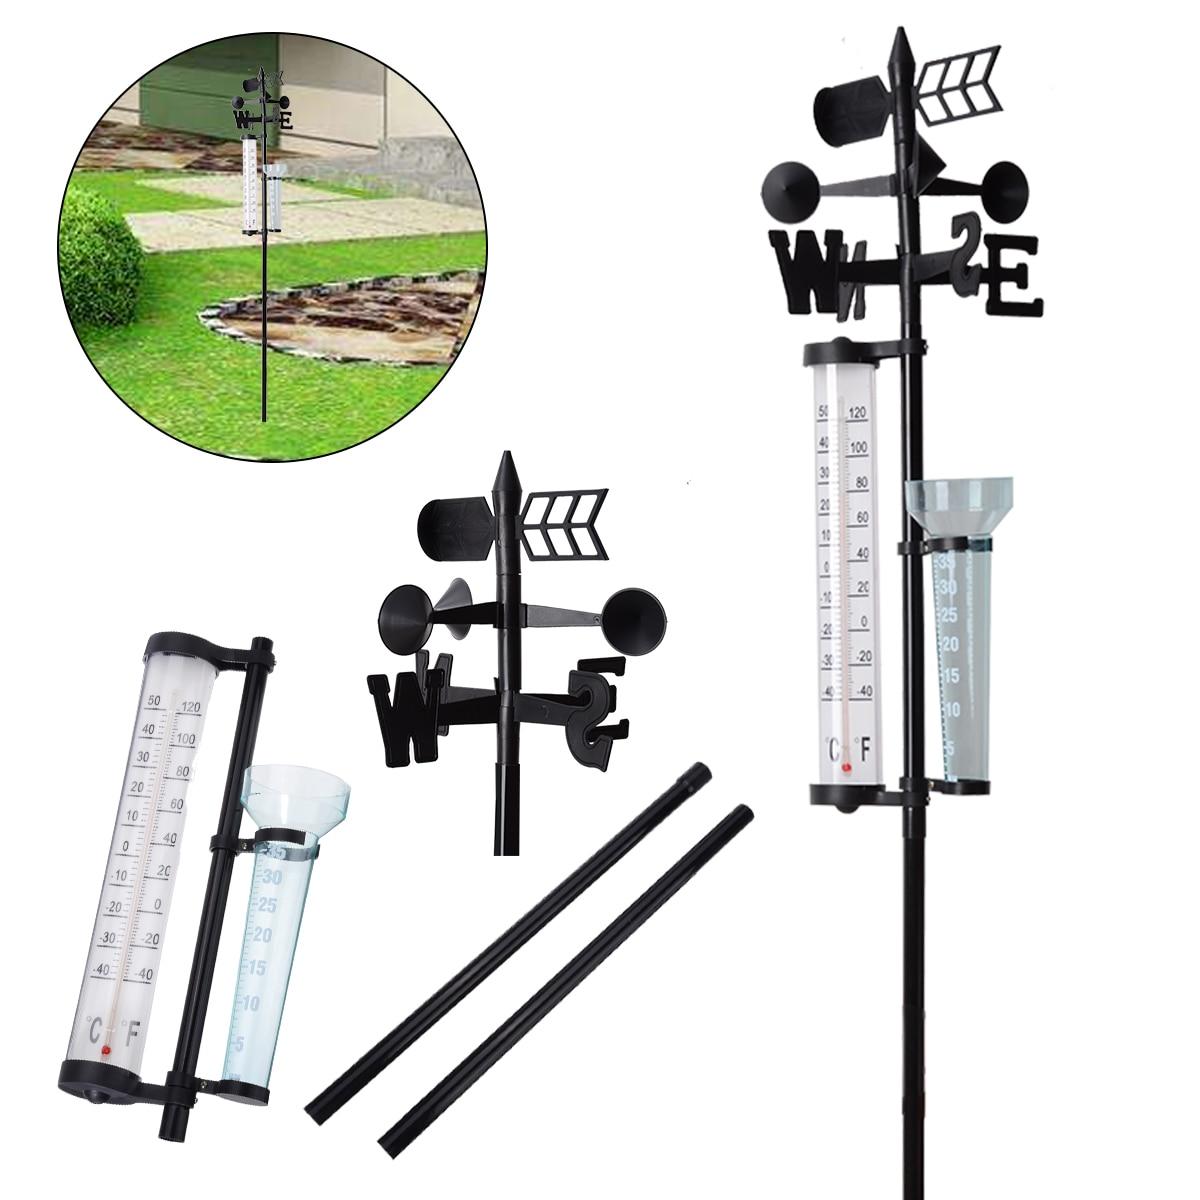 1pcs Mayitr Outdoor Garden Weather Station Meteorological Measurer Vane Wind Rain Gauge Analysis Instruments